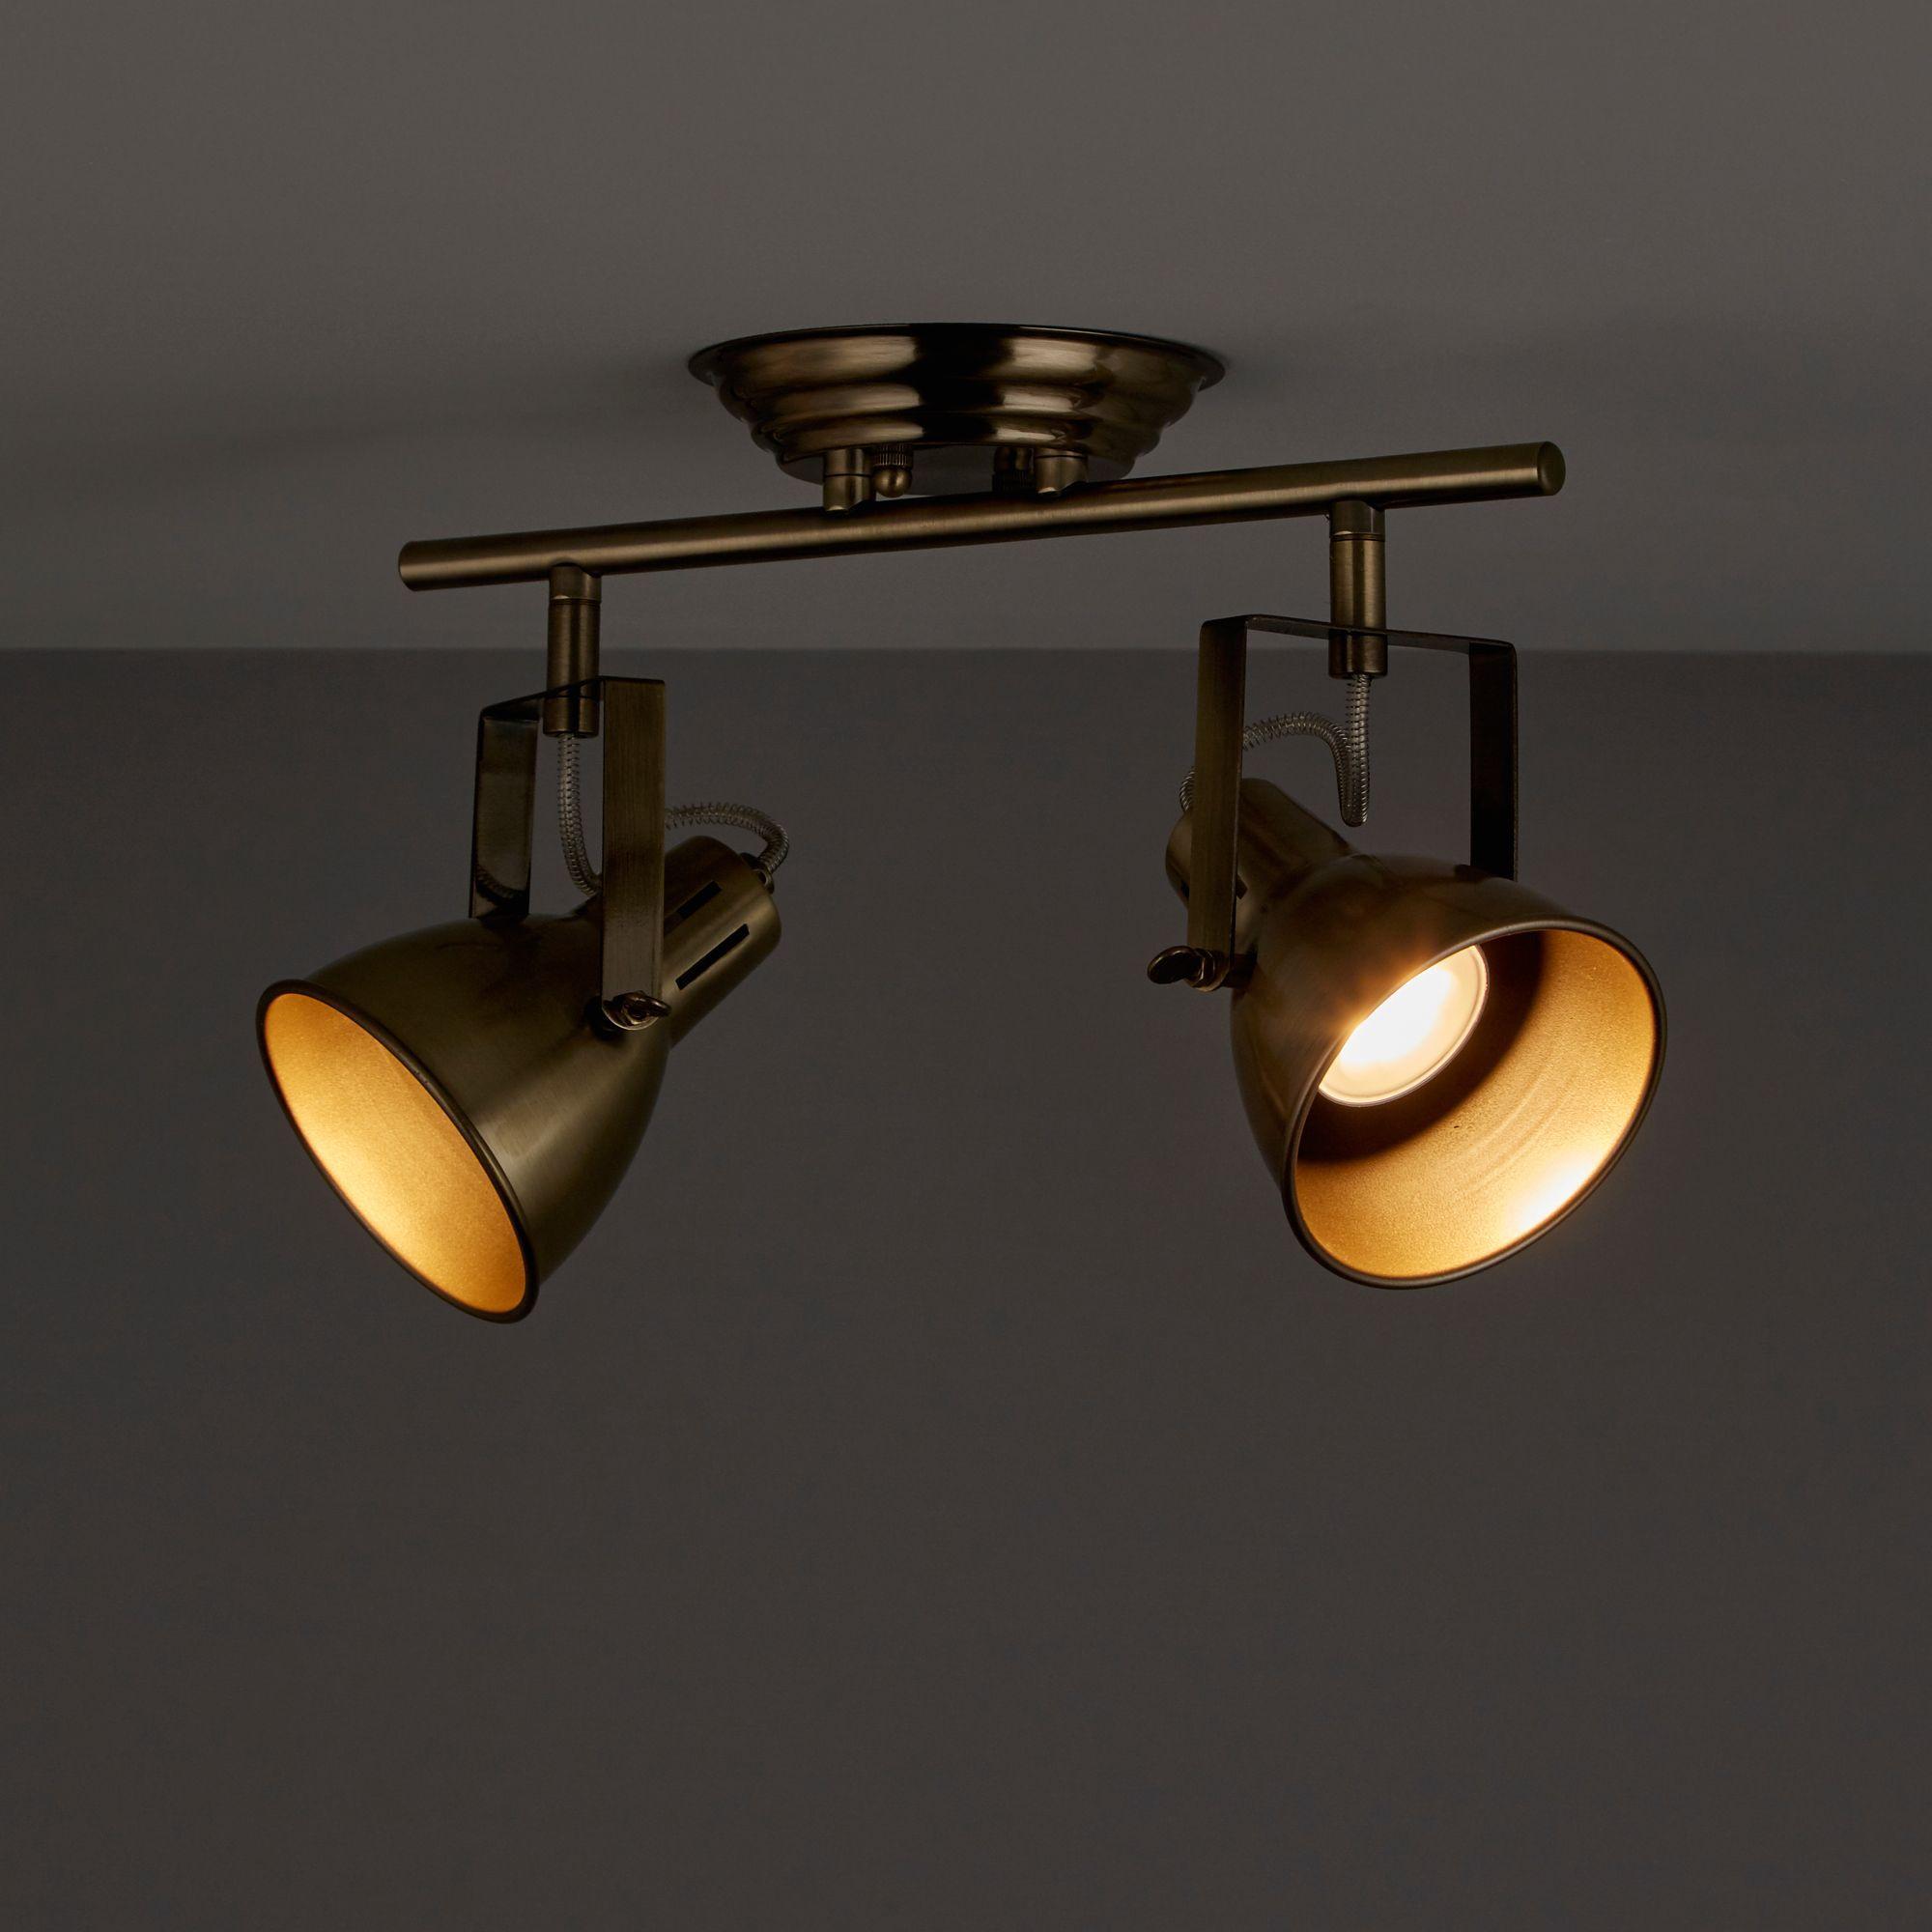 Asterion Antique brass 2 Lamp Spotlight